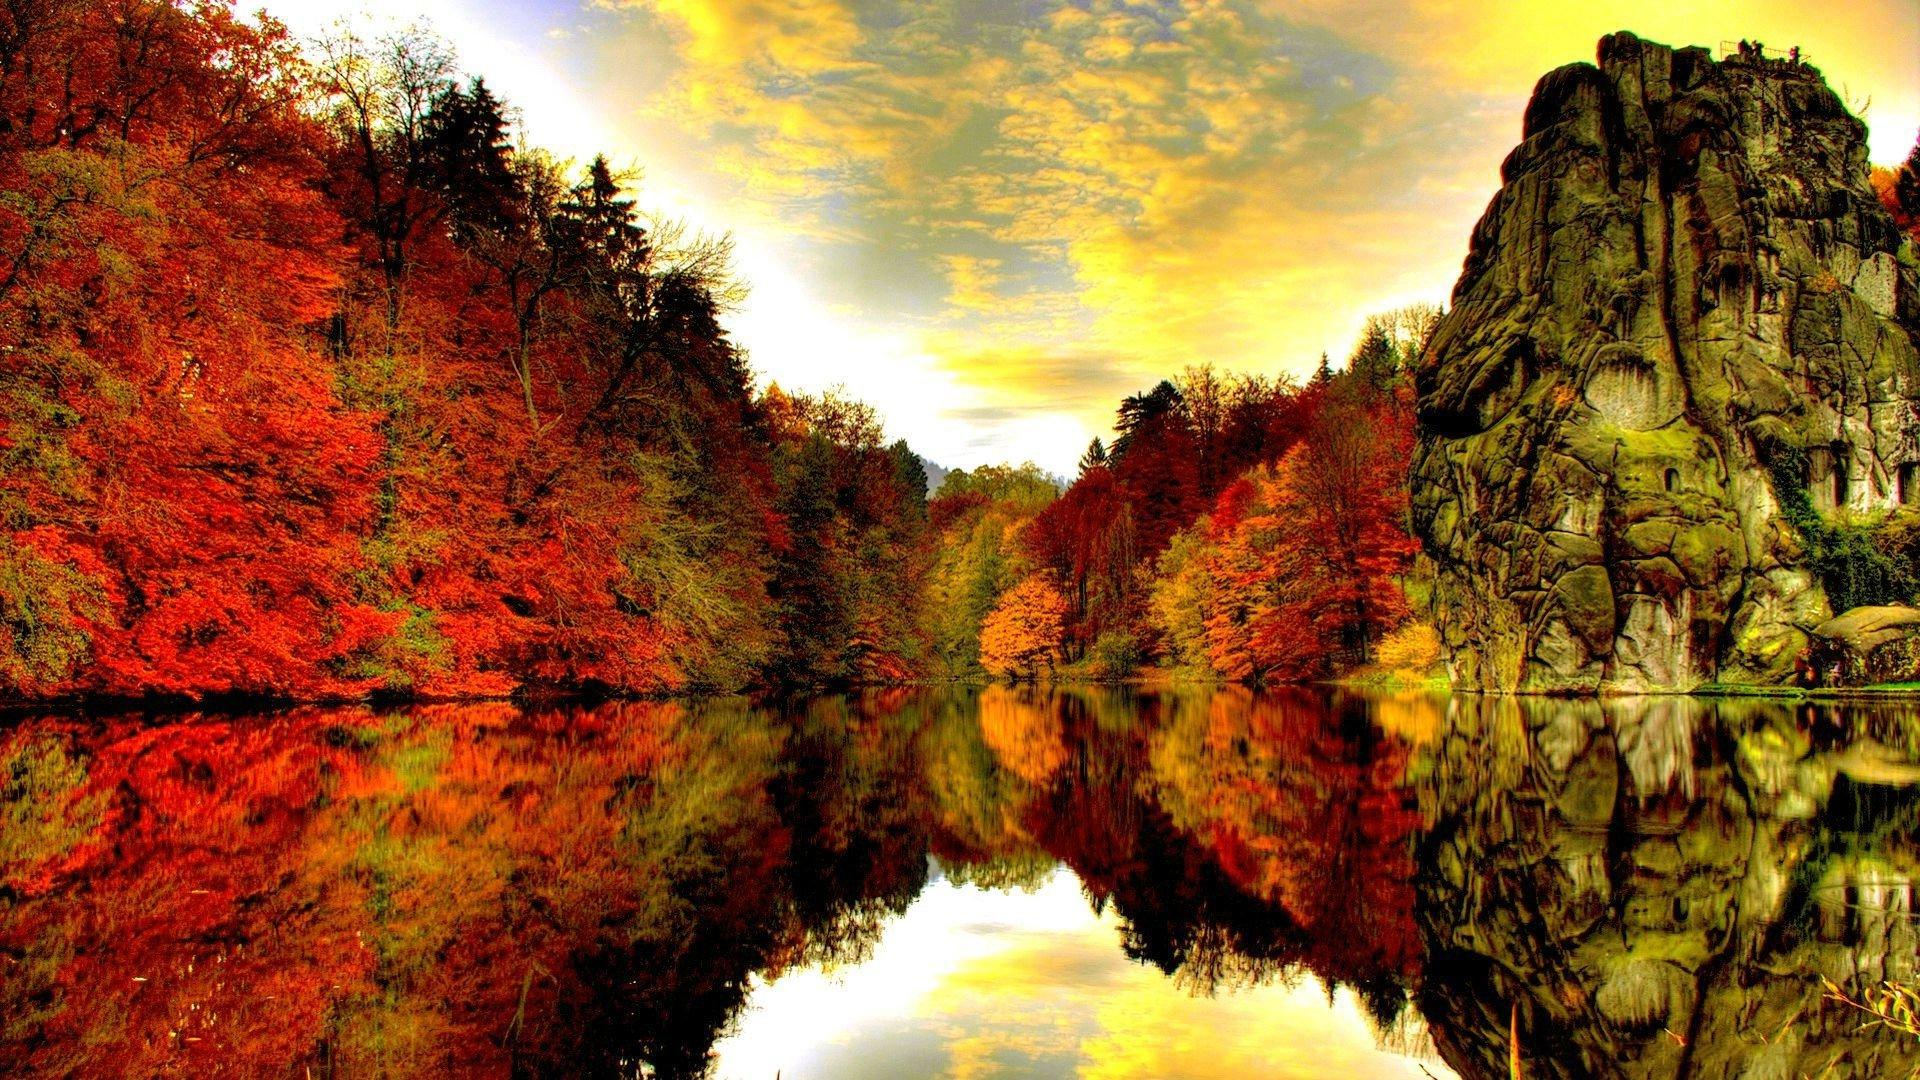 Fall Thanksgiving Desktop Wallpaper Download Free Crazy Backgrounds Pixelstalk Net